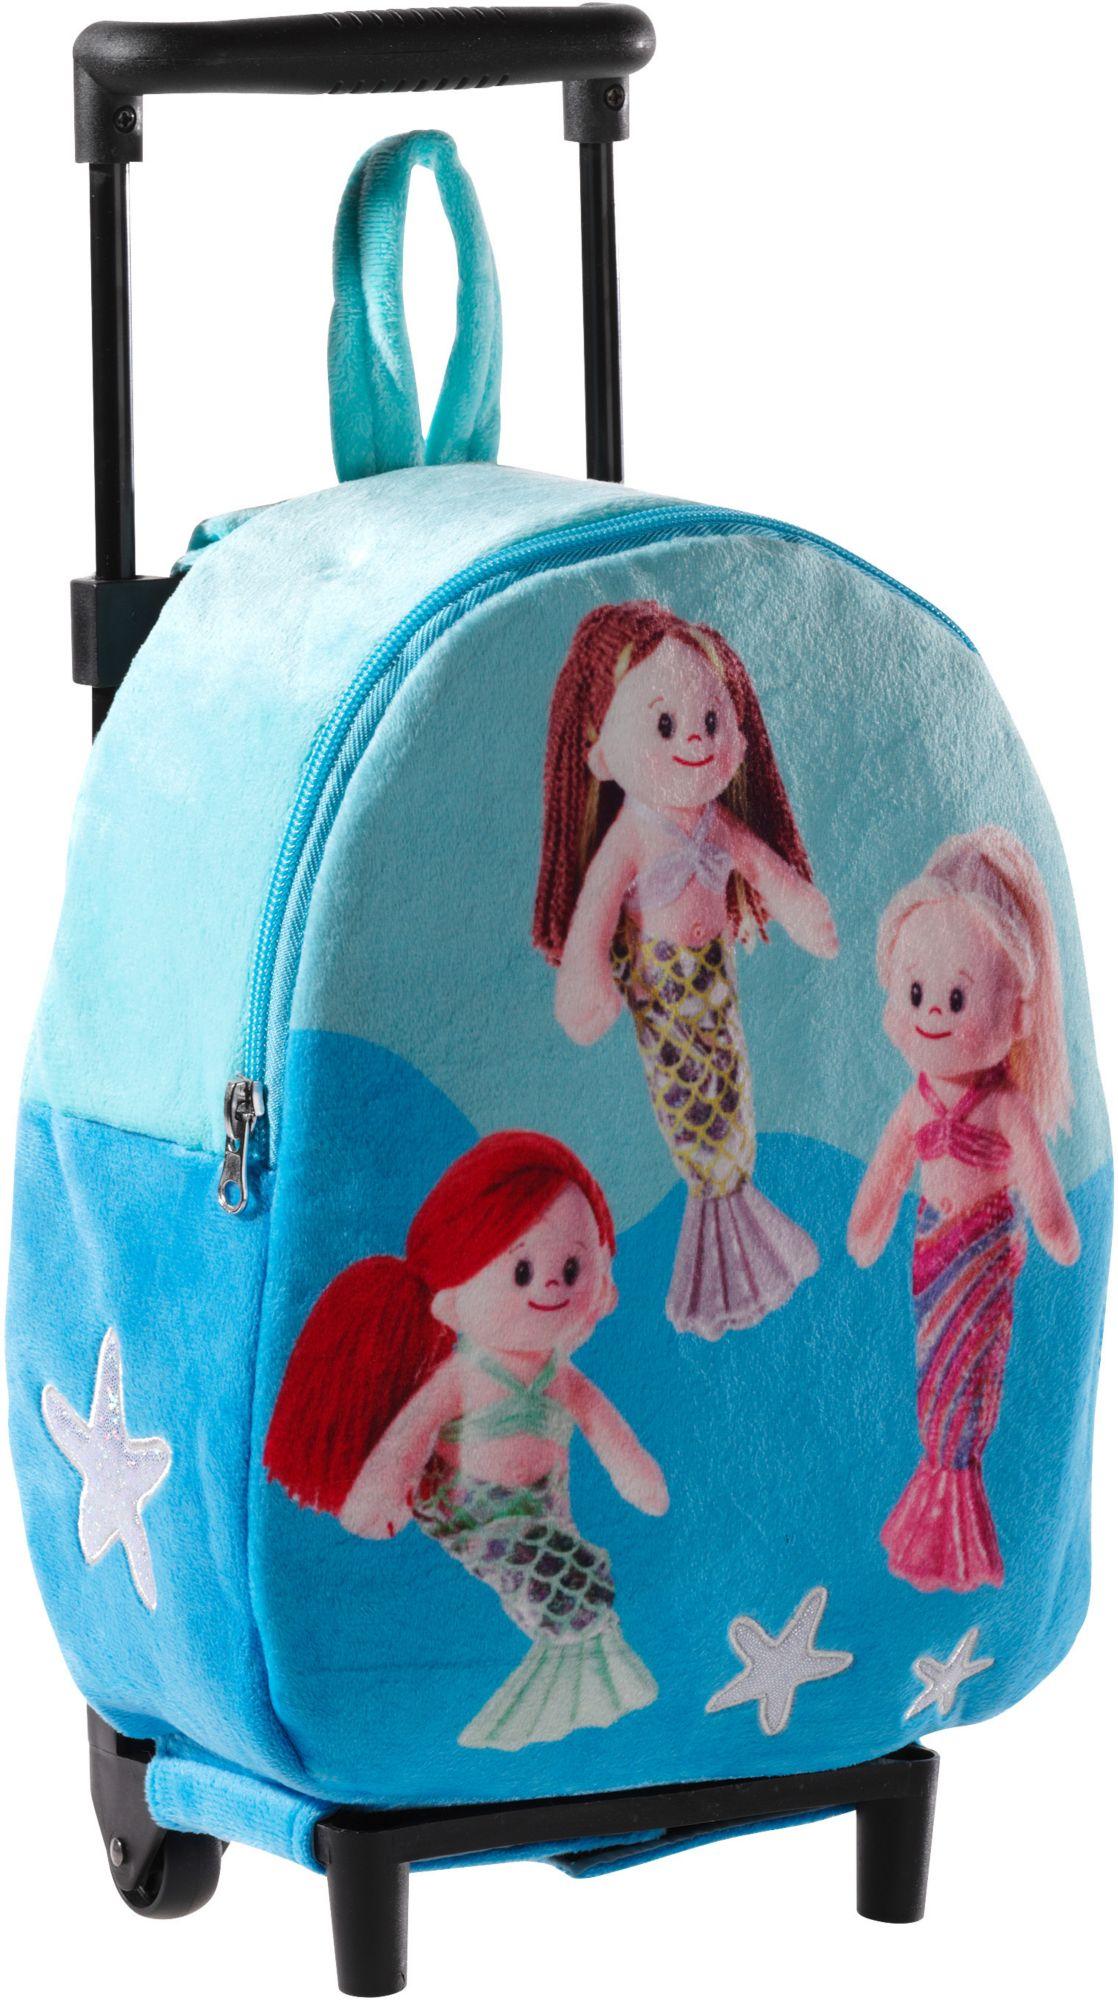 HEUNEC Heunec Kinderkoffer mit Meerjungfrauen, »Trolley Mermaids«